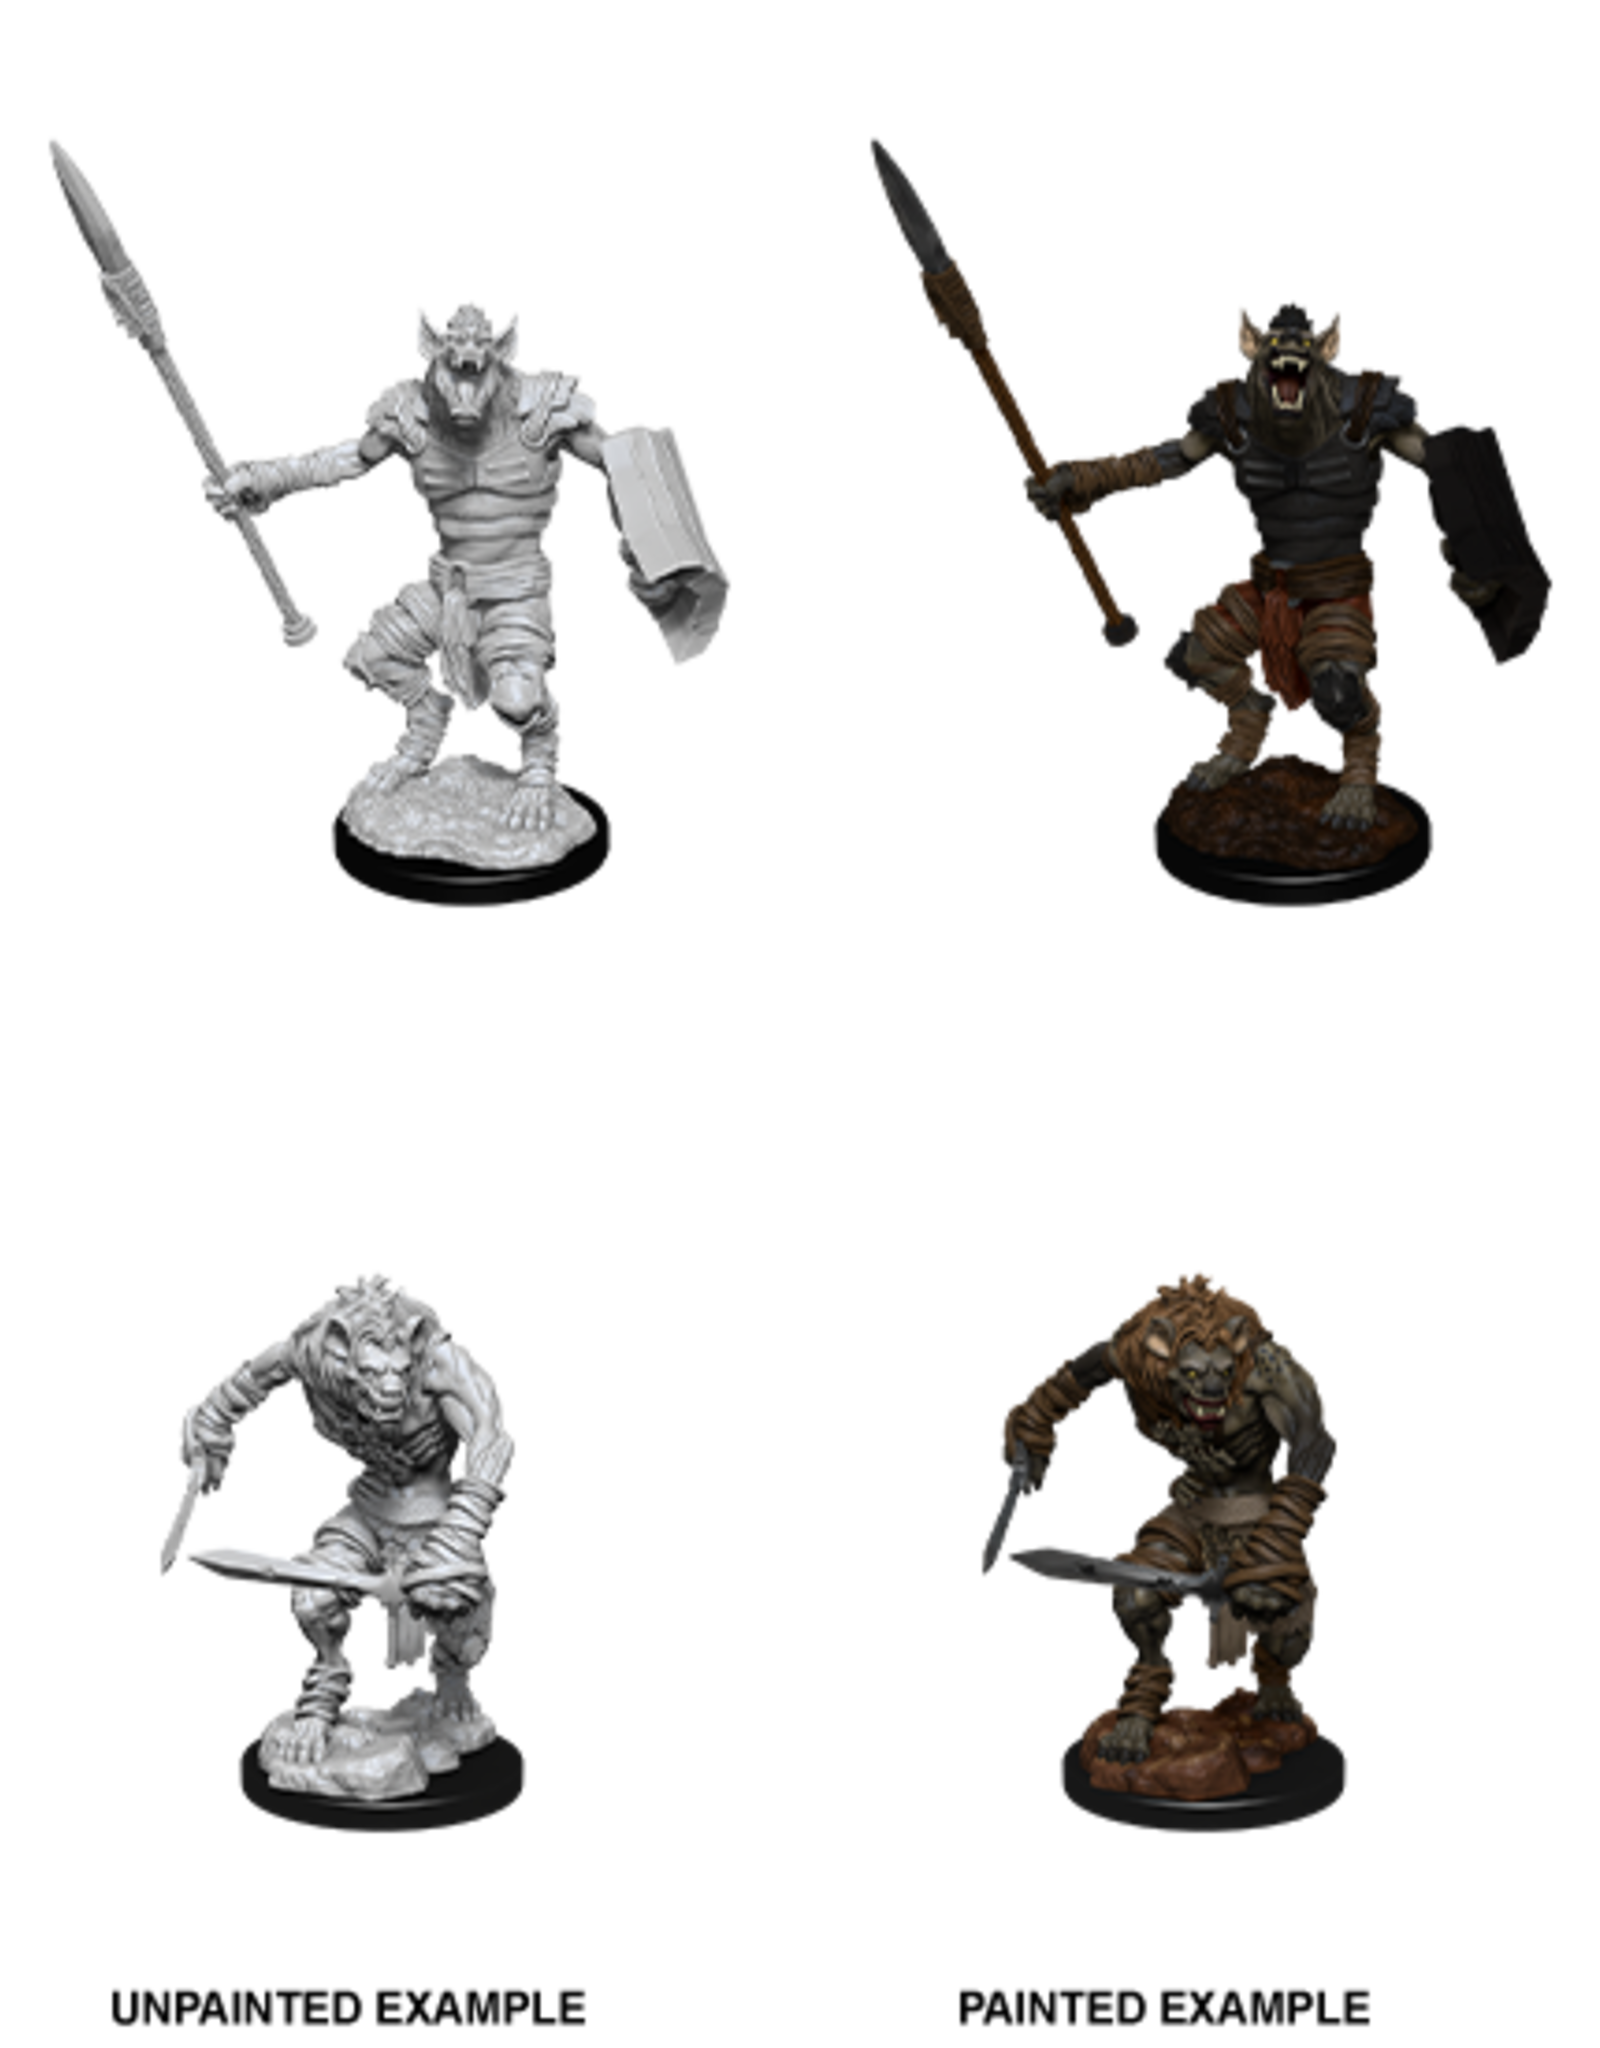 Nolzur's Marvelous Miniatures D&D D&D NMU - Gnoll & Gnoll Flesh Gnawer (W12)